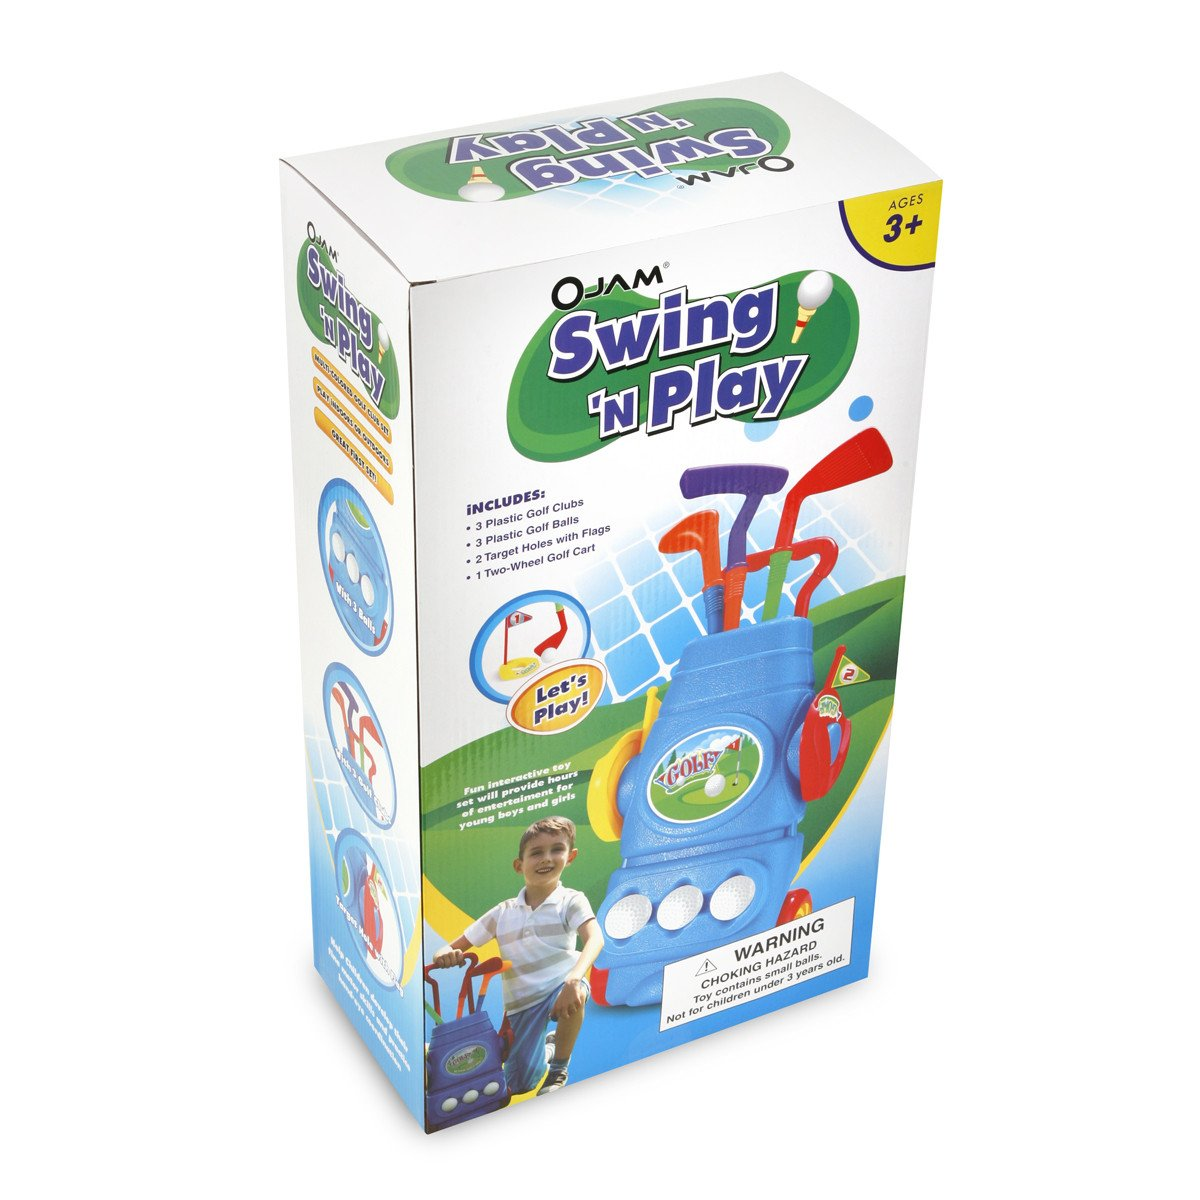 Ojam Swing 'N Play Kids Toy Golf Set (9) (9 Piece) by Ojam (Image #4)